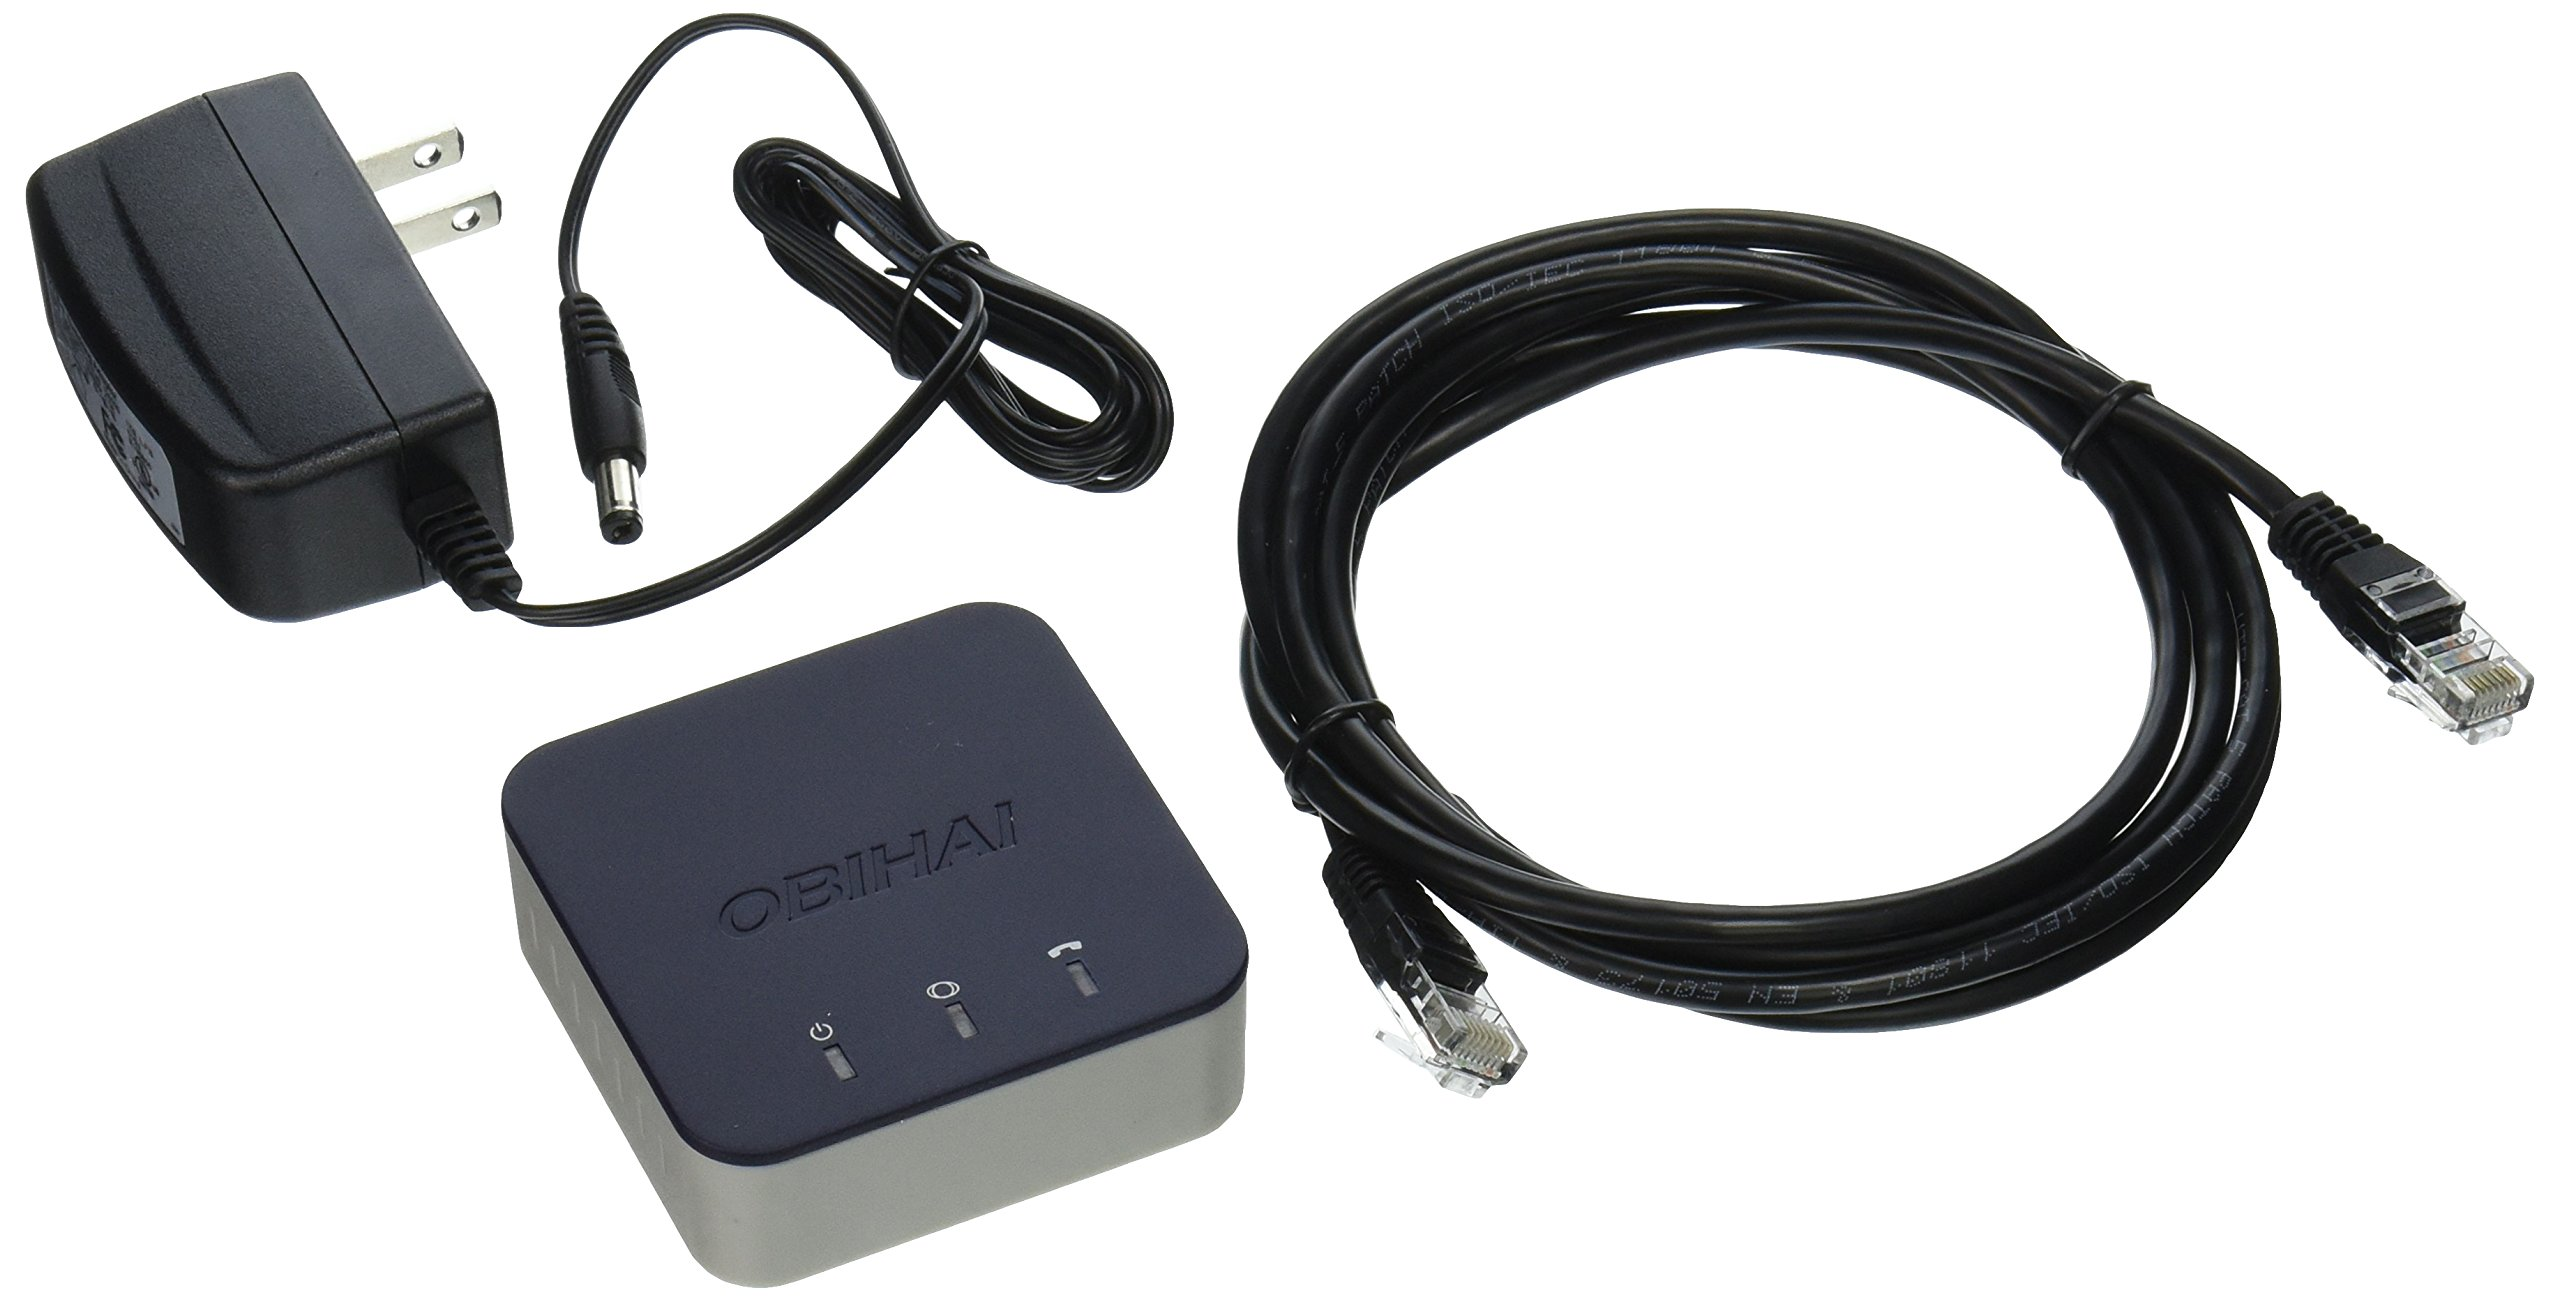 Obihai Technology OBi300 VoIP Telephone Adapter